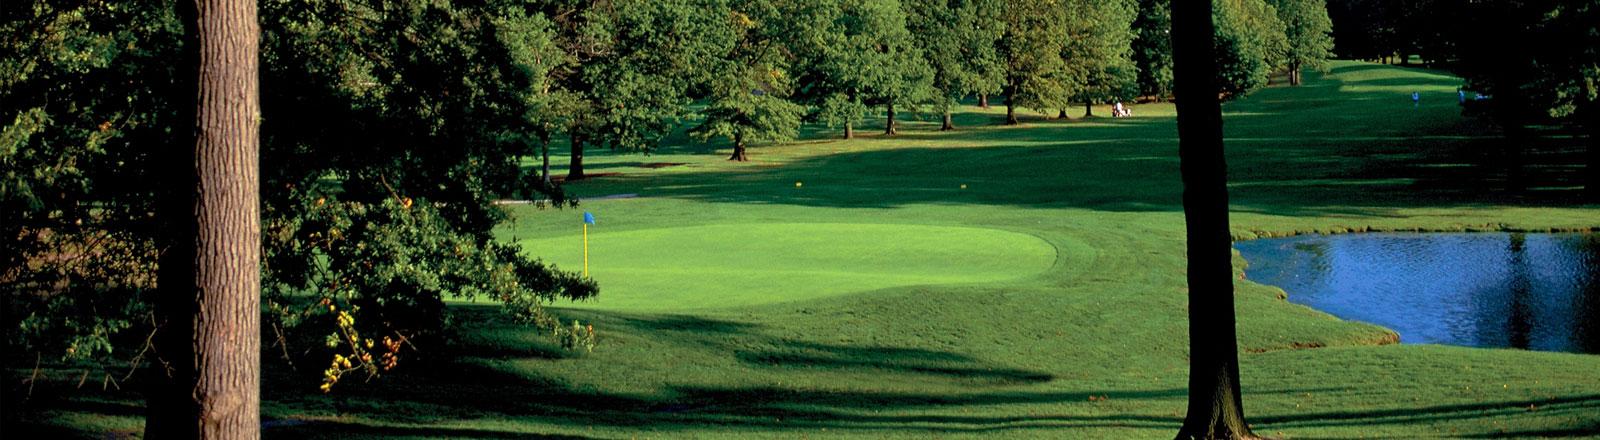 South Shore Golf Course Staten Island